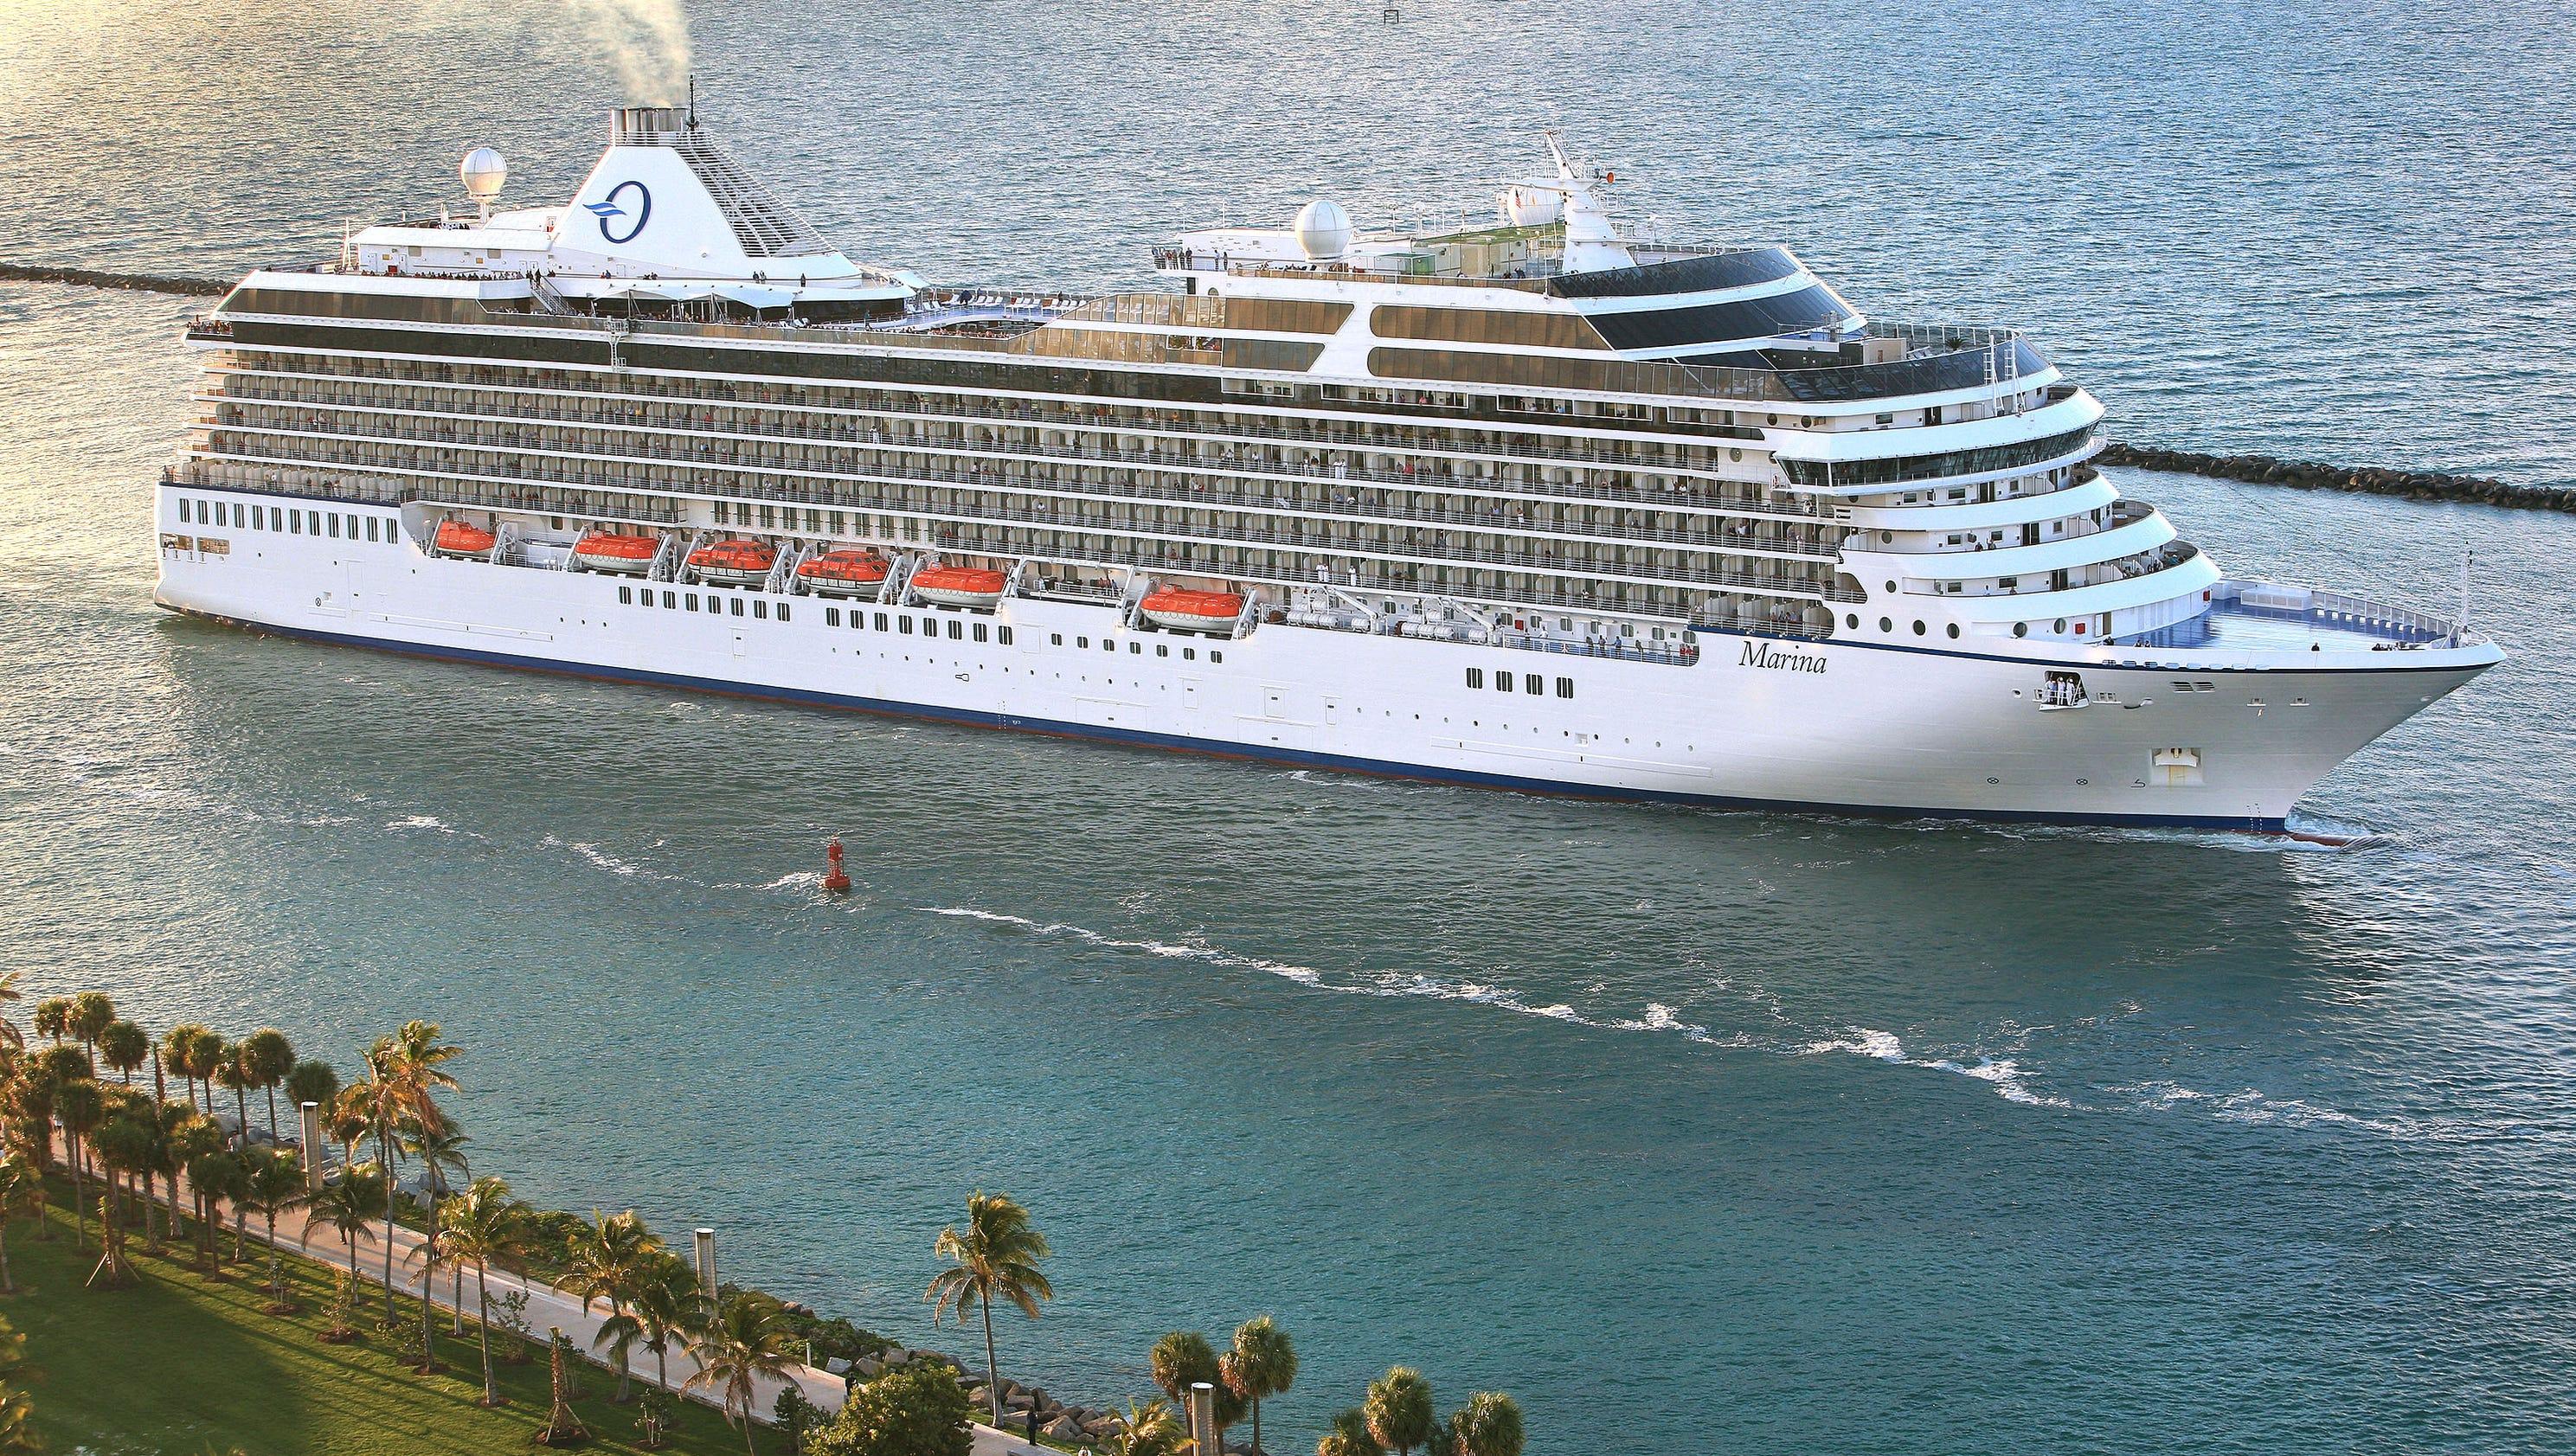 Cruise ship tours: Oceania Cruises' Marina